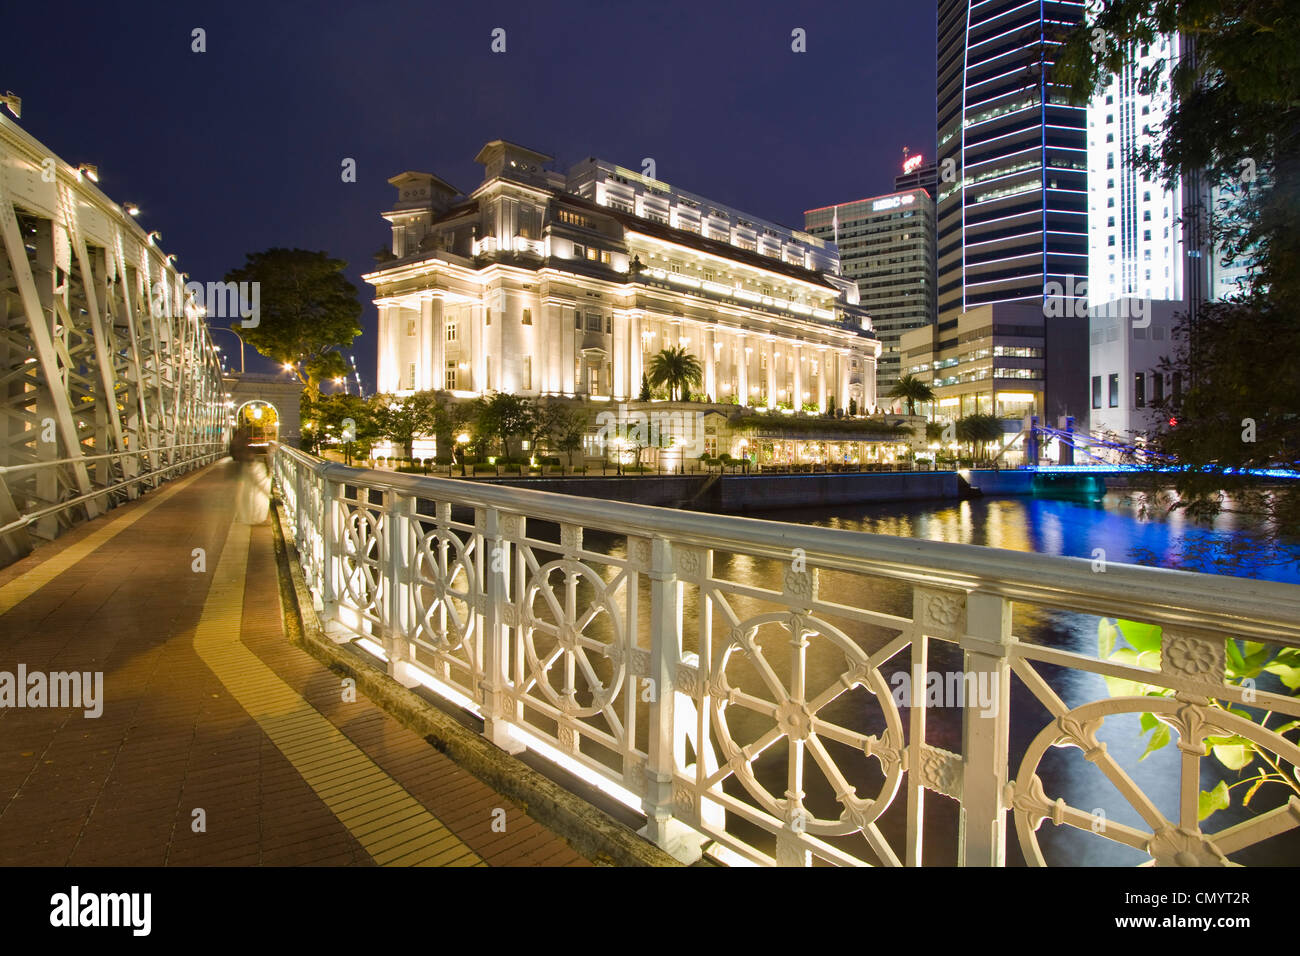 Cavenagh Brücke, Fullerton Hotel, Skyline von Singapur, Süd-Ost-Asien, twilight Stockfoto